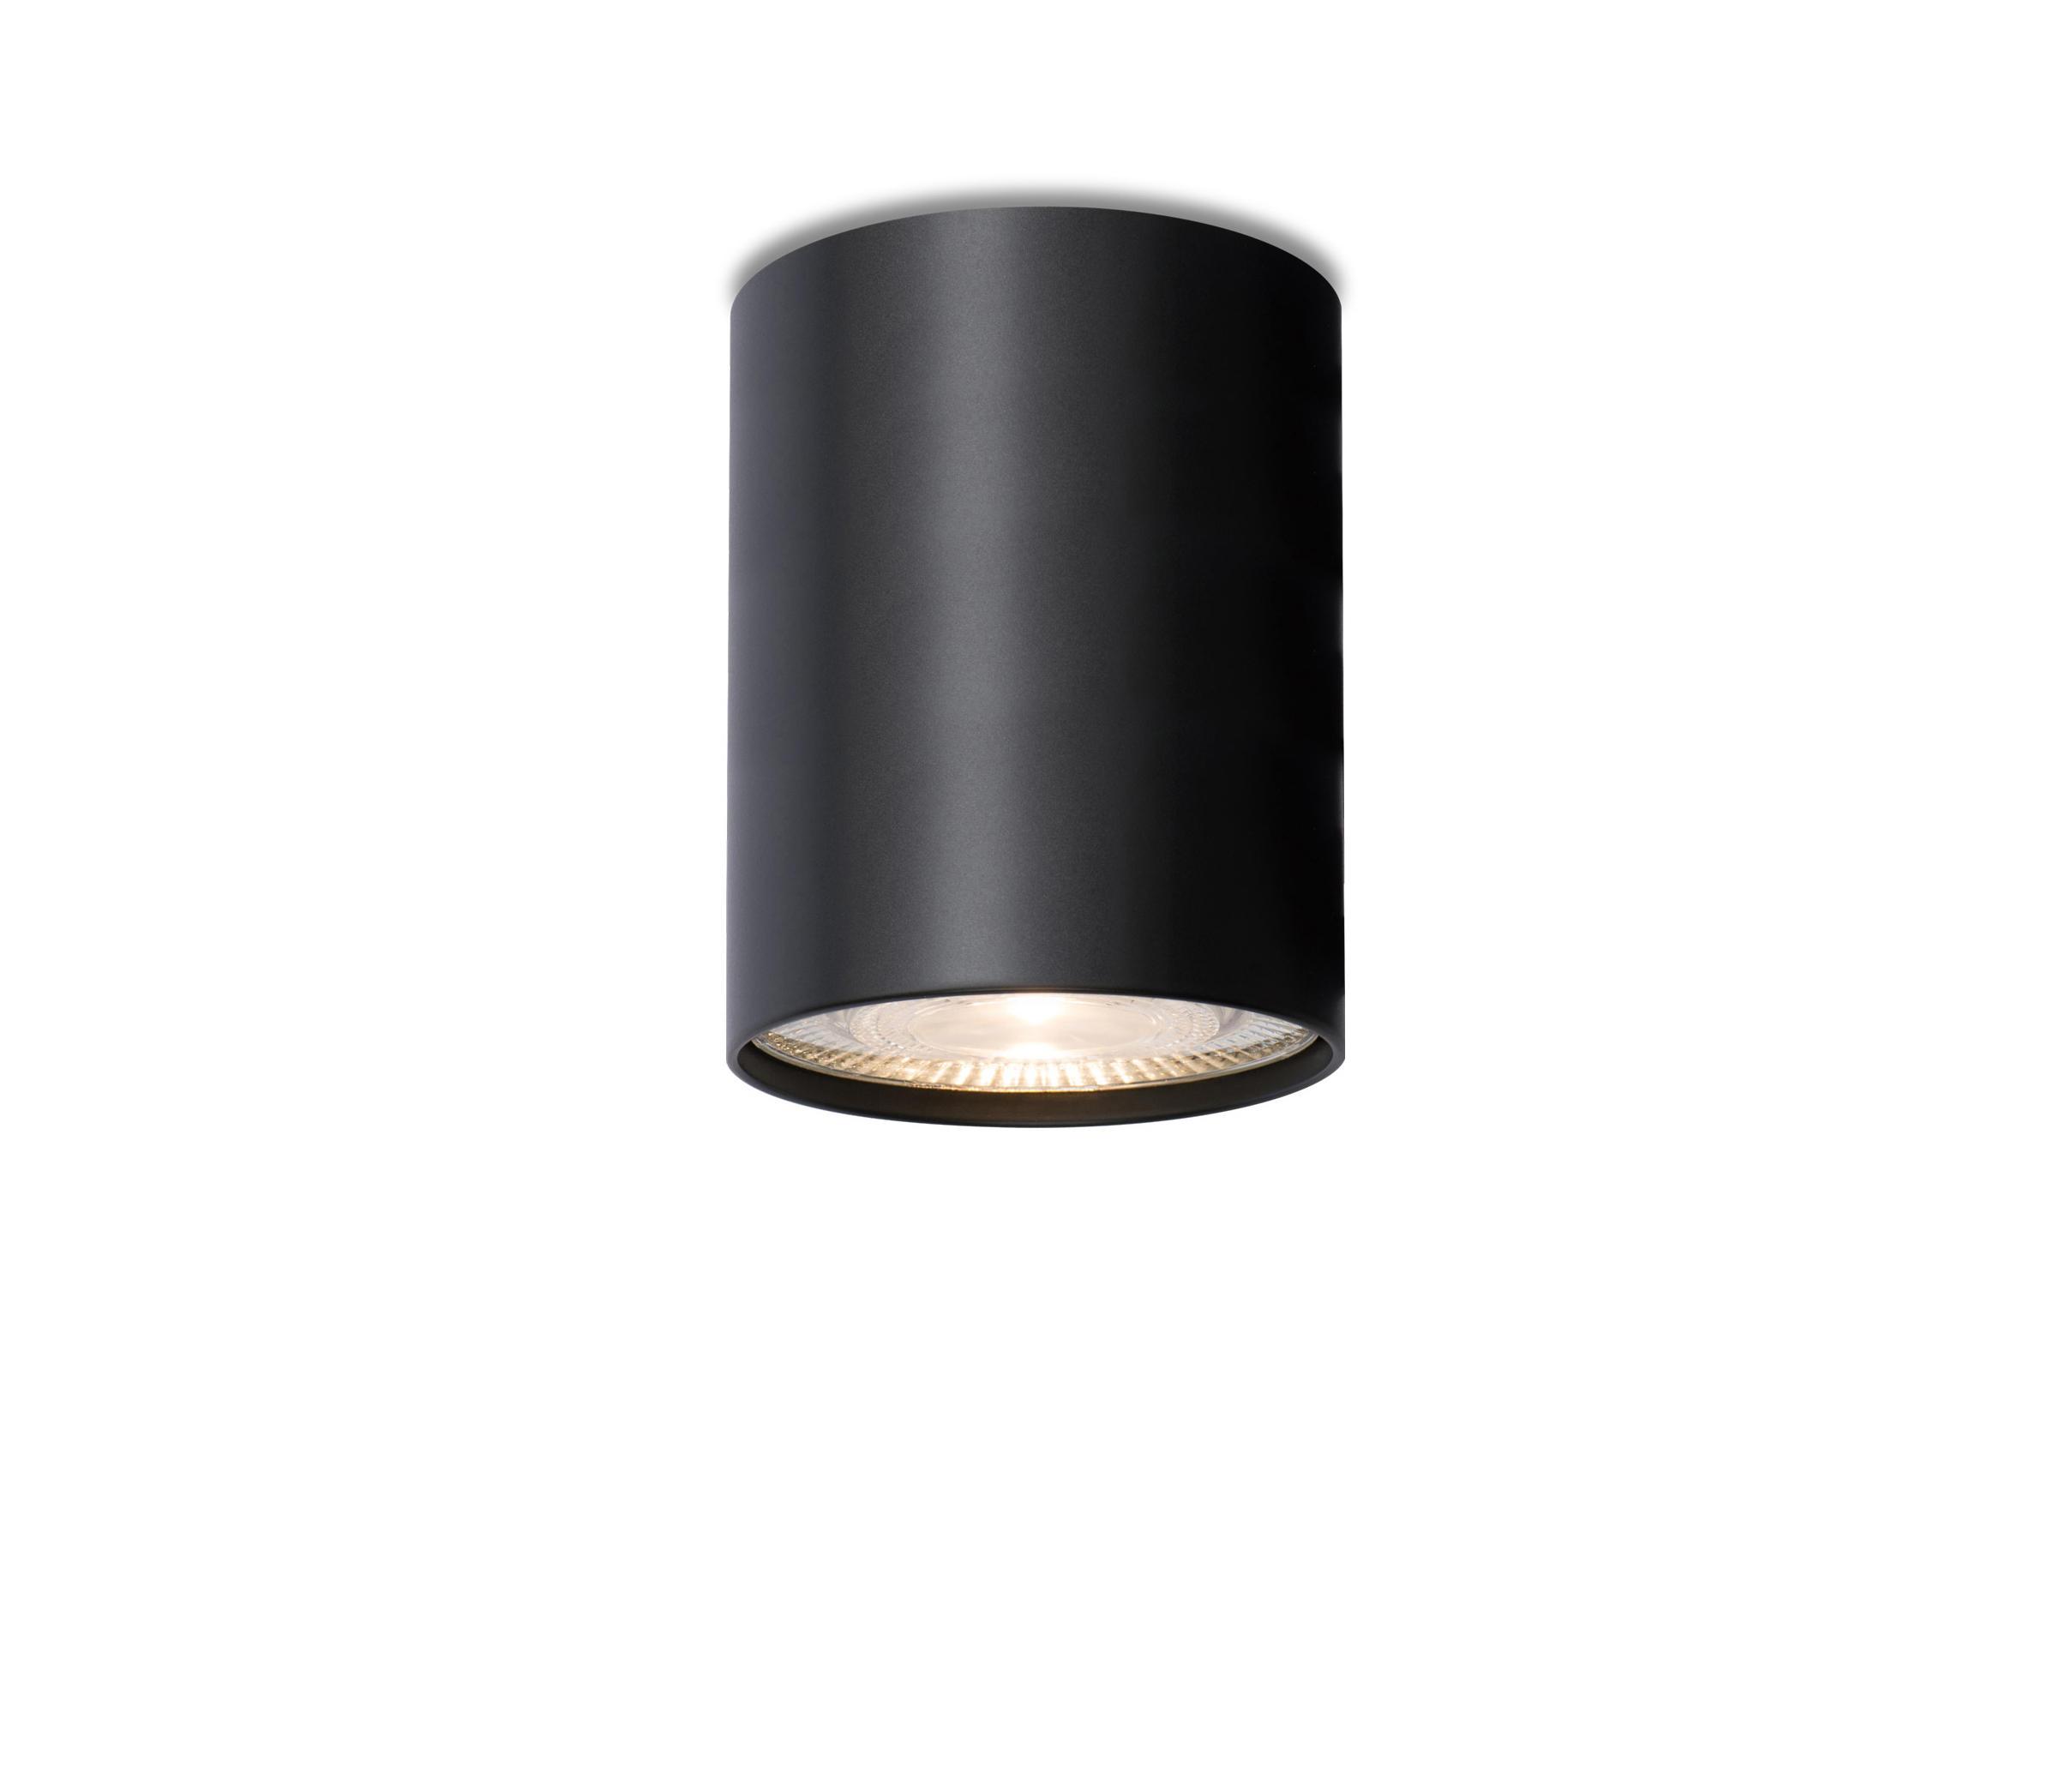 Mawa Wittenberg wittenberg wi4 ab 1r dl general lighting from mawa design architonic